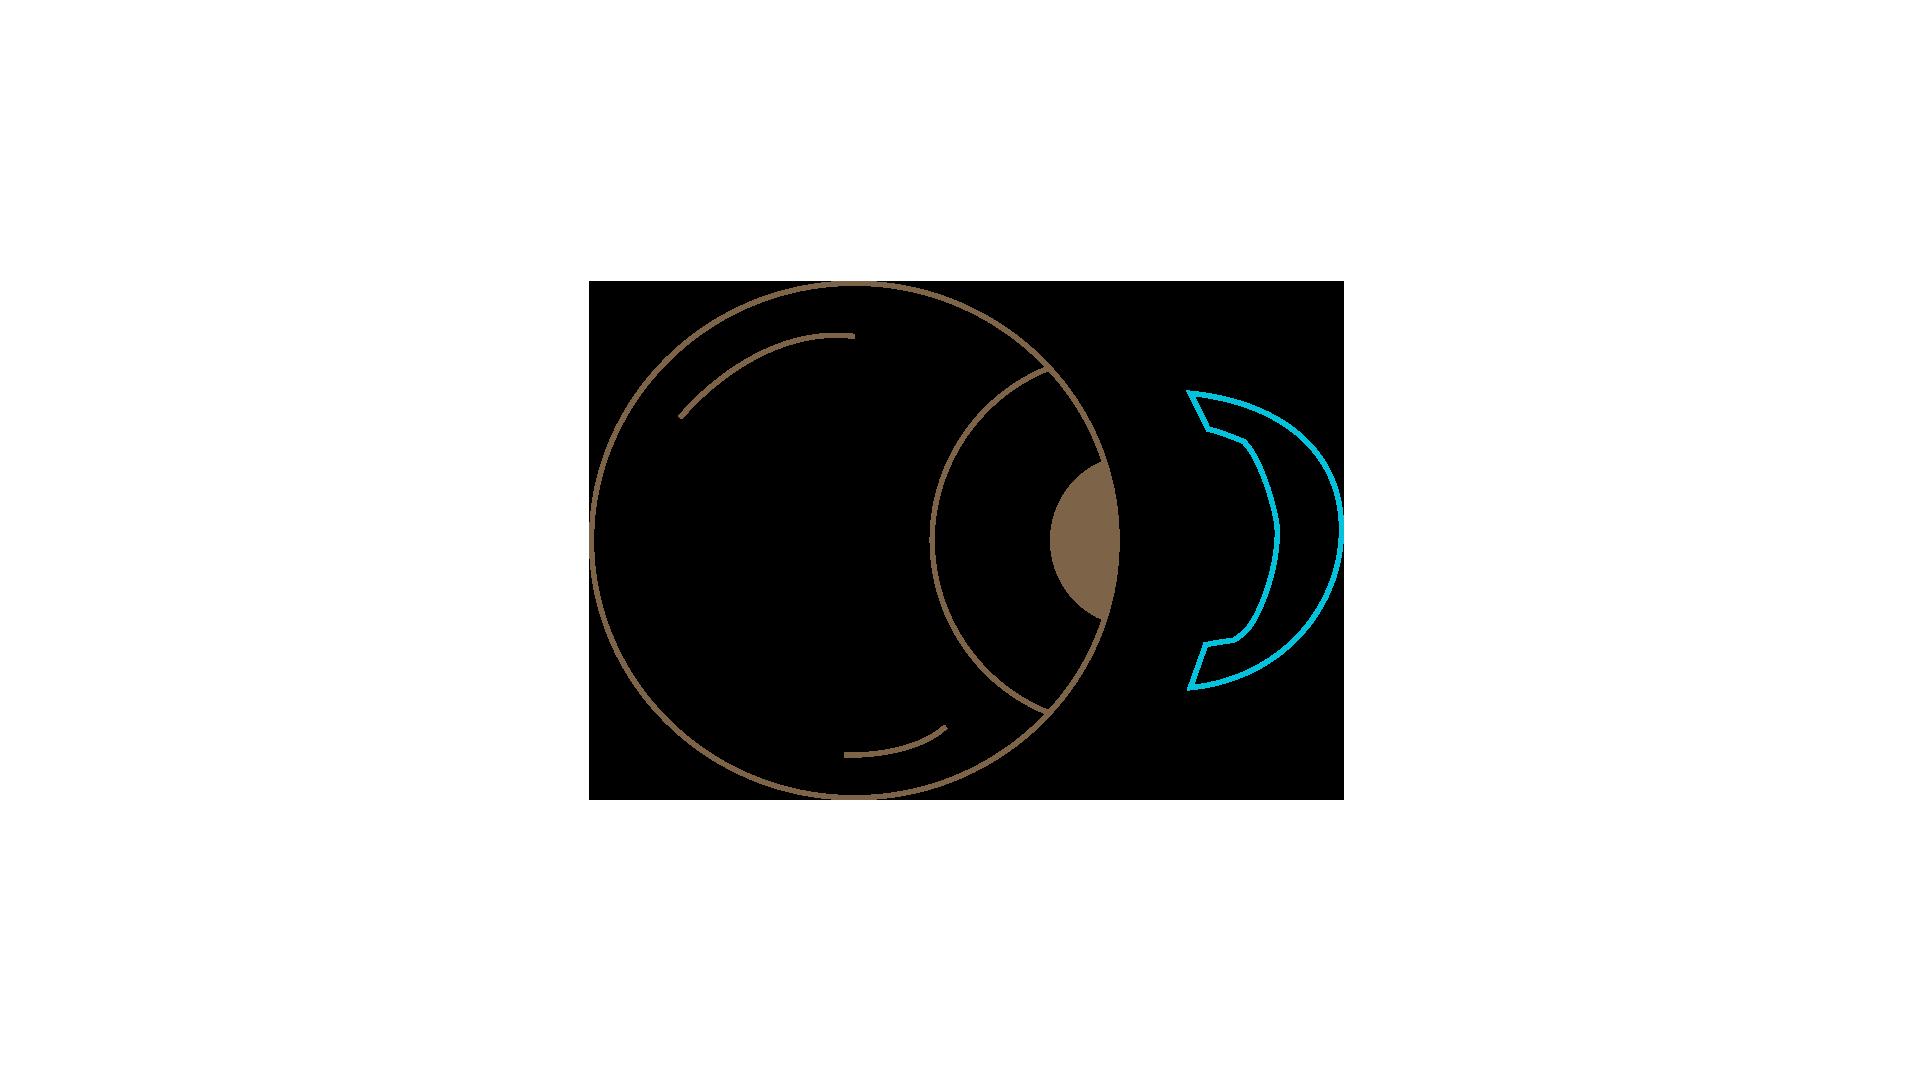 access-optic-type-004